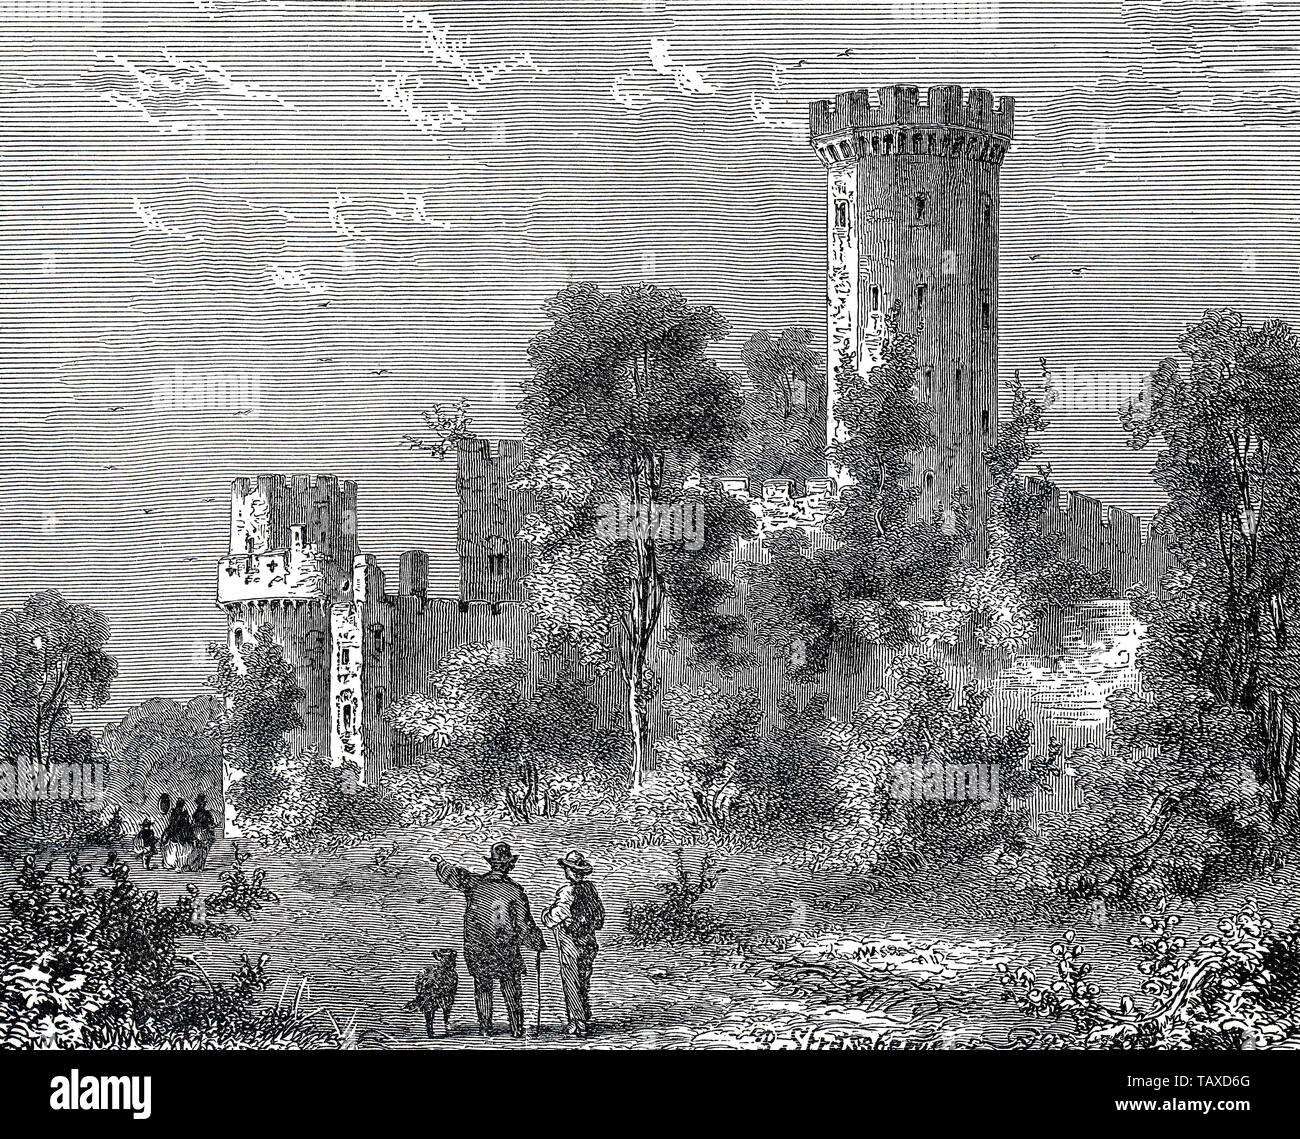 Warwick Castle, England, Europe, historic engraving from the 19th century, Schloss Warwick, England, Europa, historischer Stich aus dem 19. Jahrhundert - Stock Image